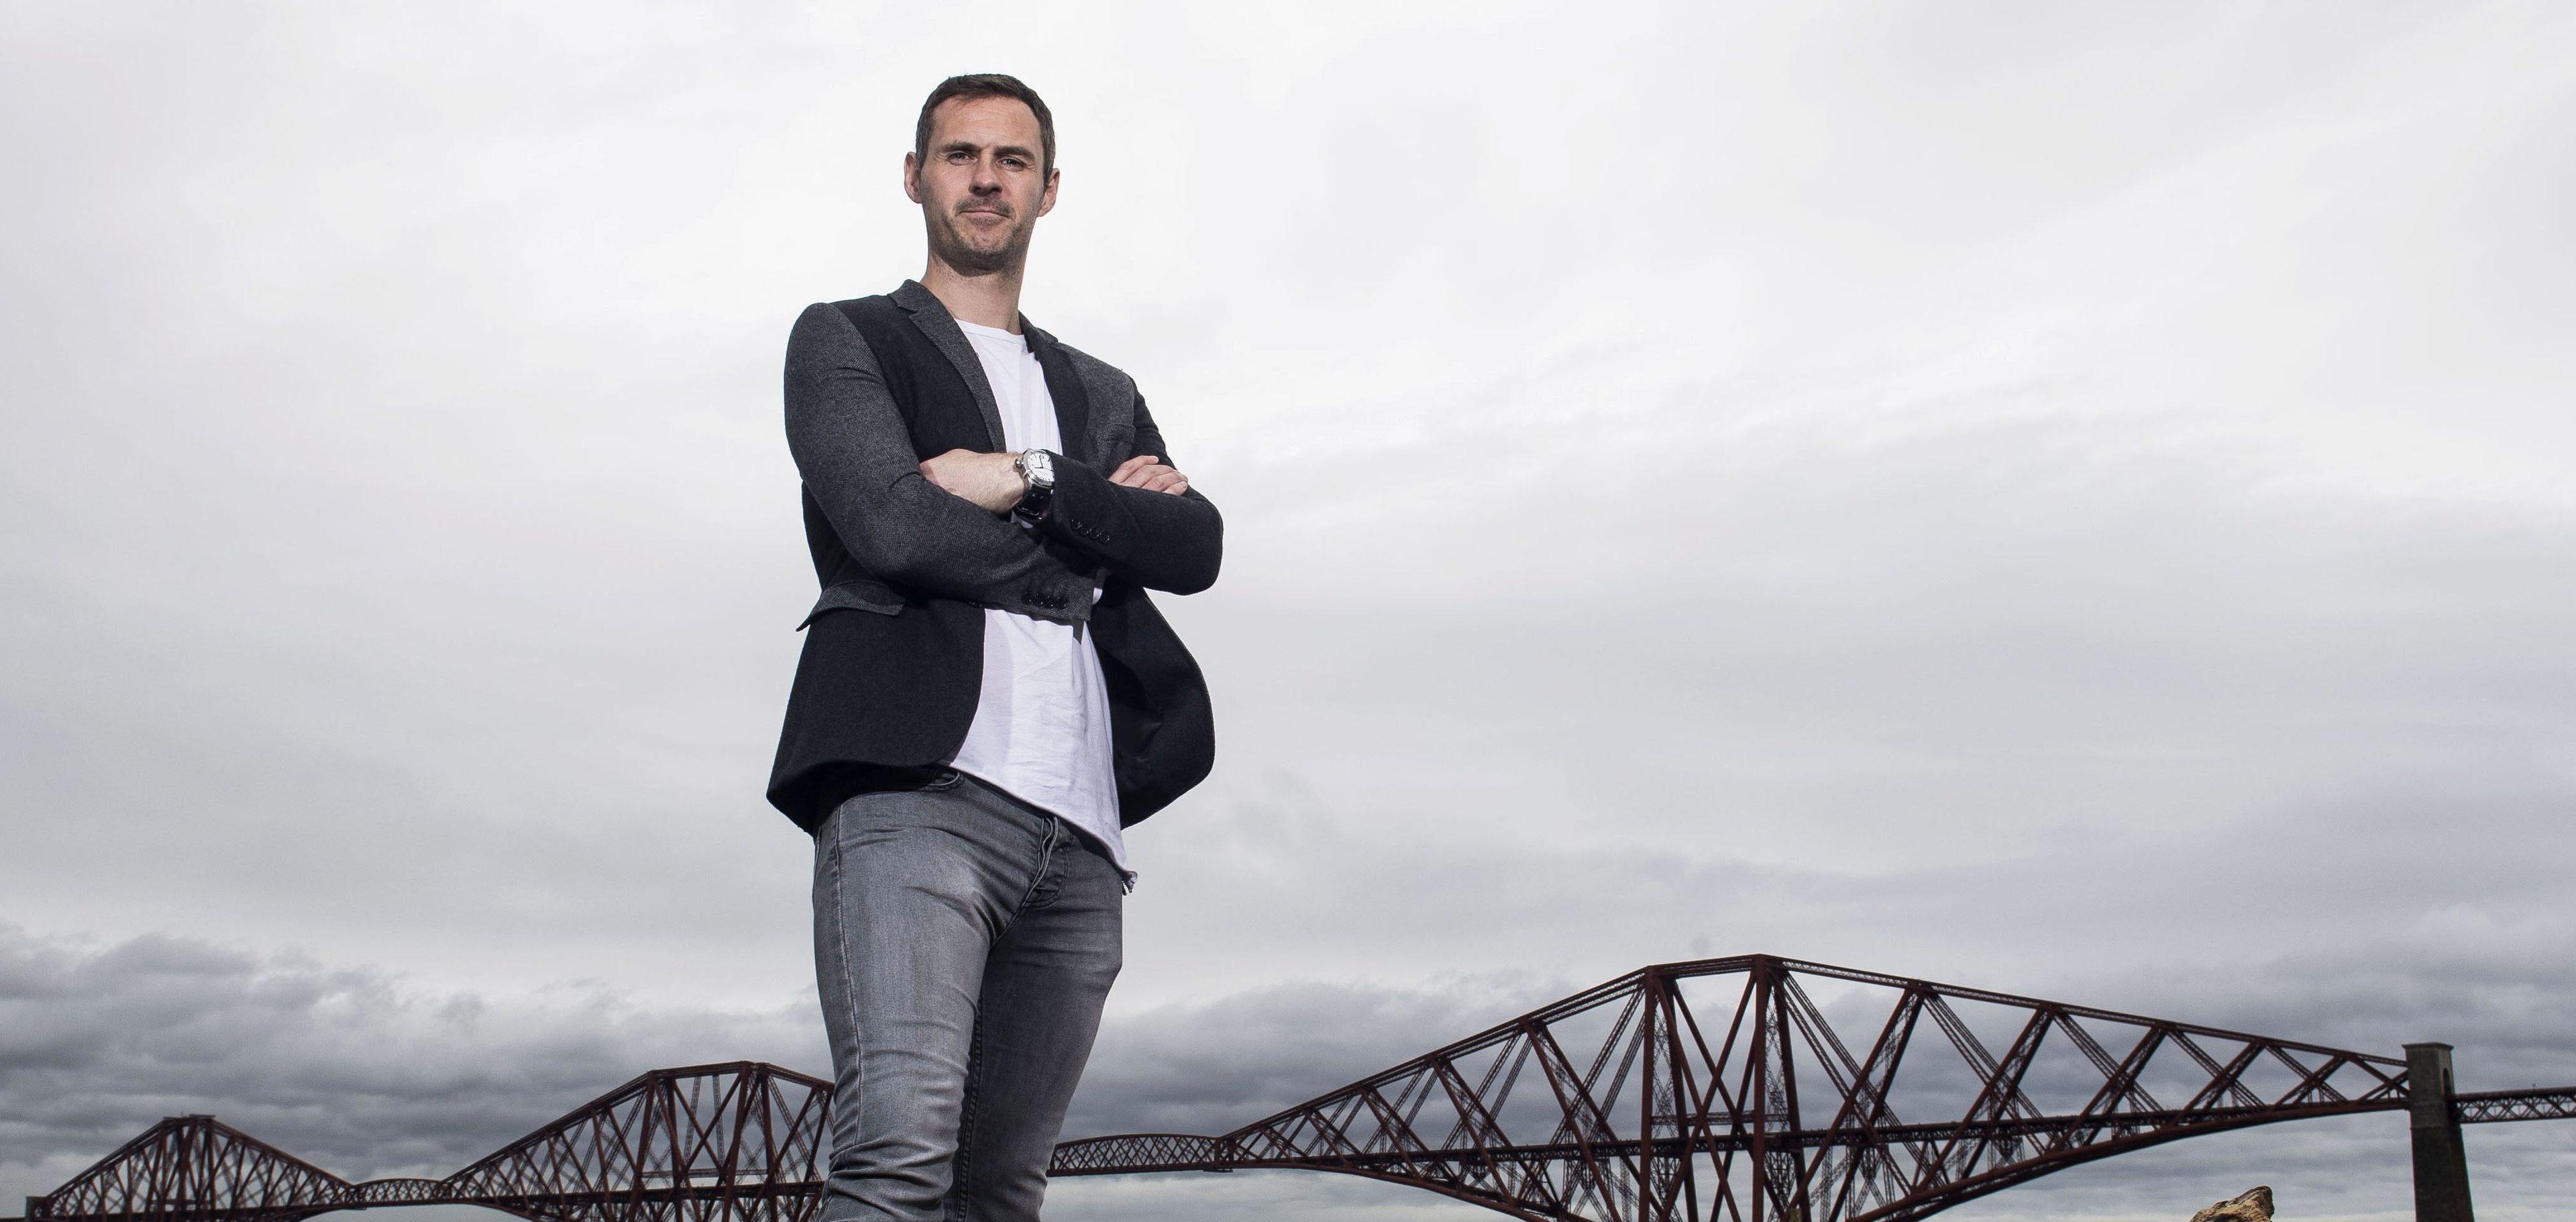 Peterhead captain David McCracken wants to secure promotion this season